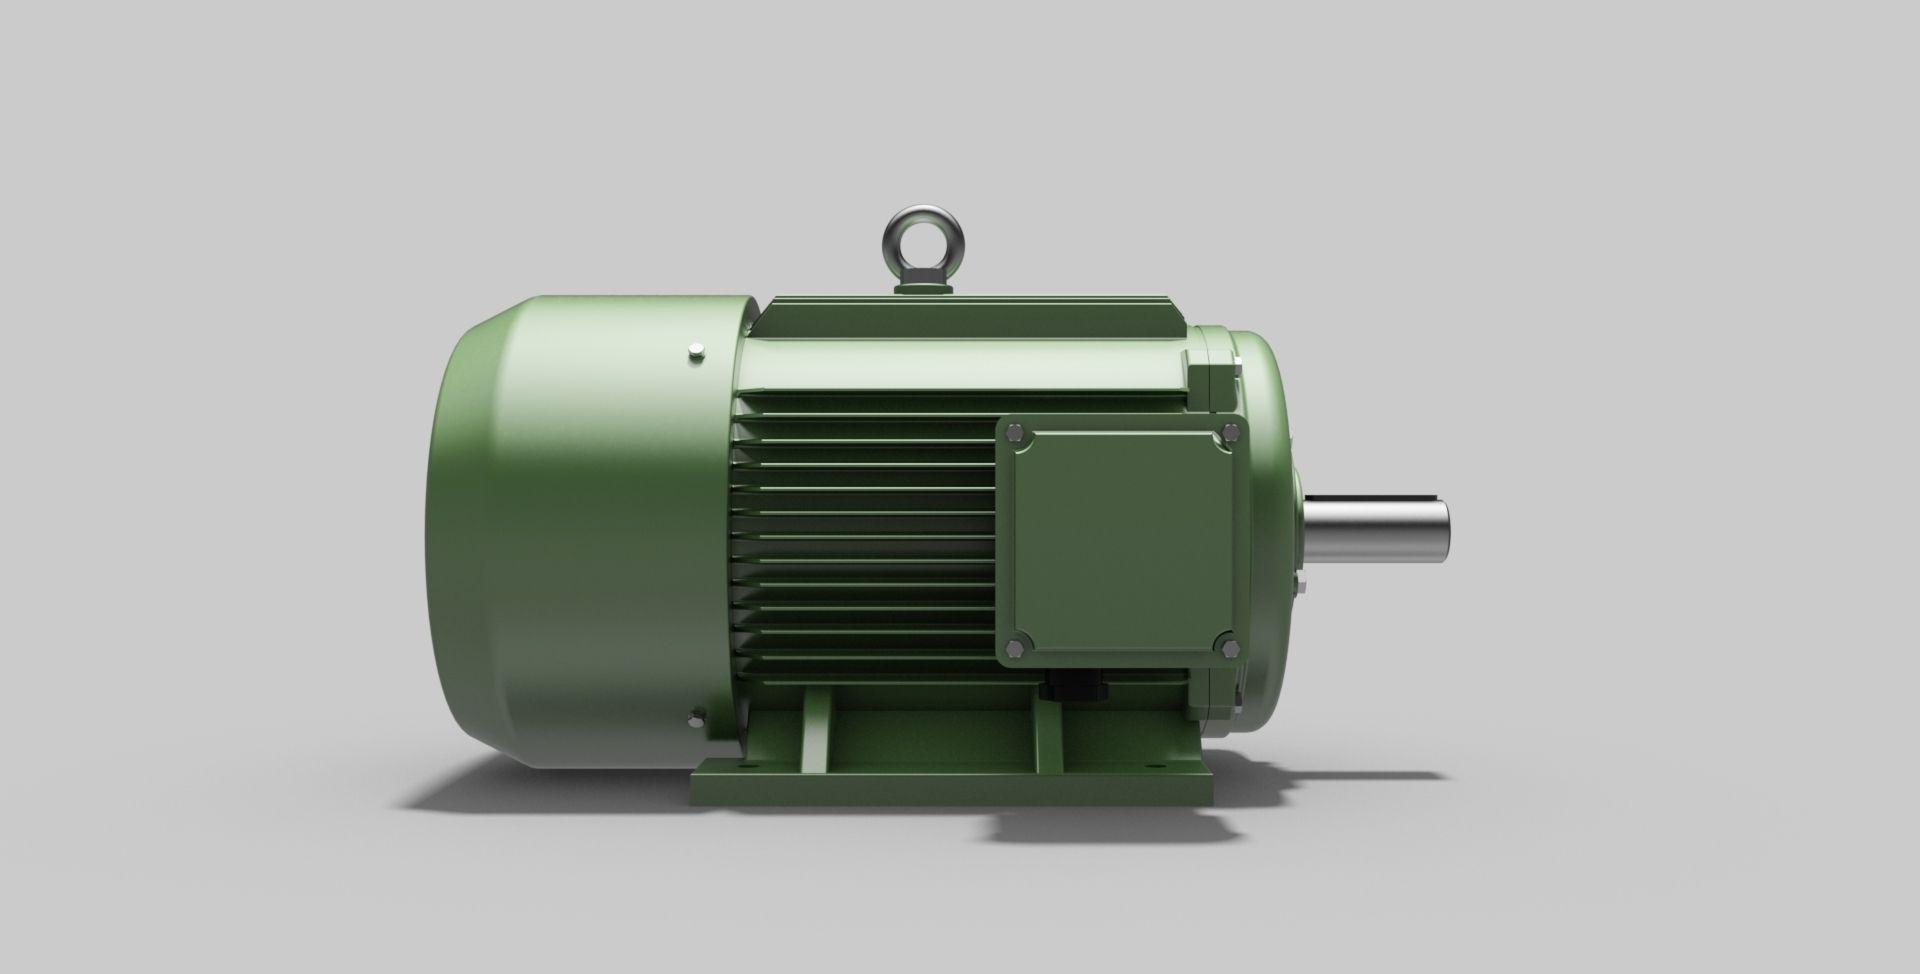 180L-B3 Left - Electric Motor - Free 3D CAD Model free 3D model DWG